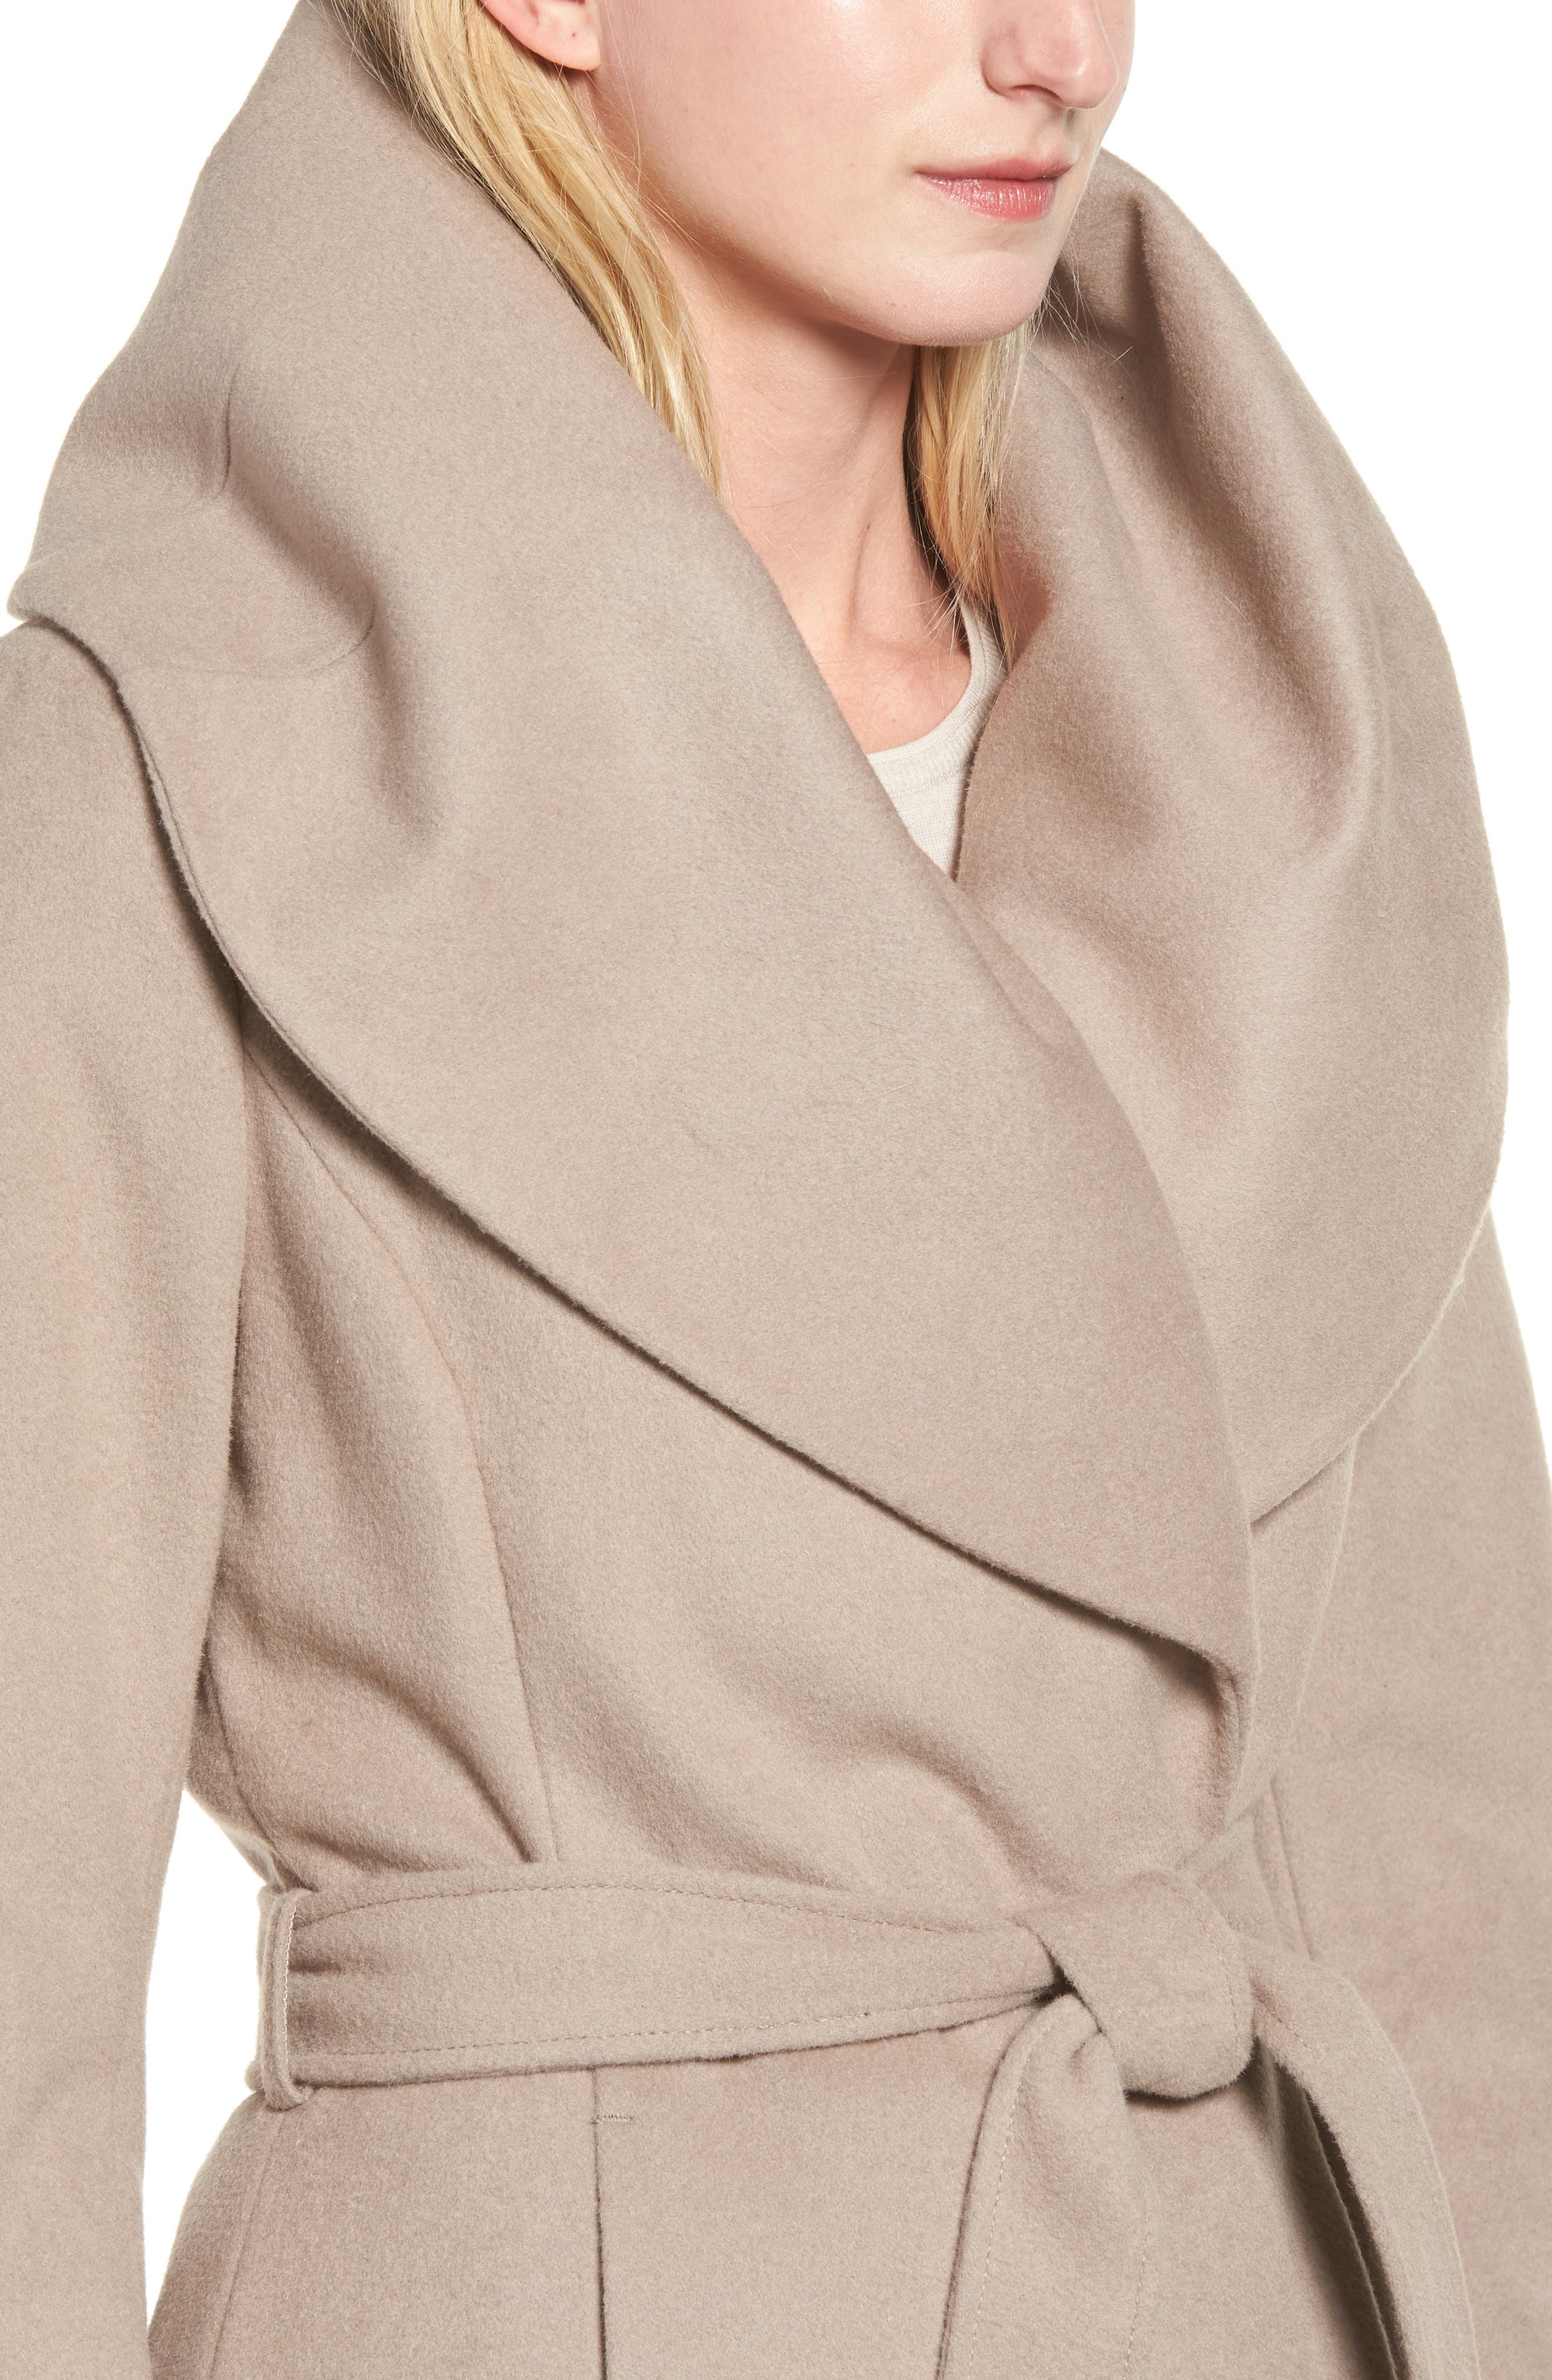 T Tahari Wool Blend Belted Wrap Coat,                             Alternate thumbnail 33, color,